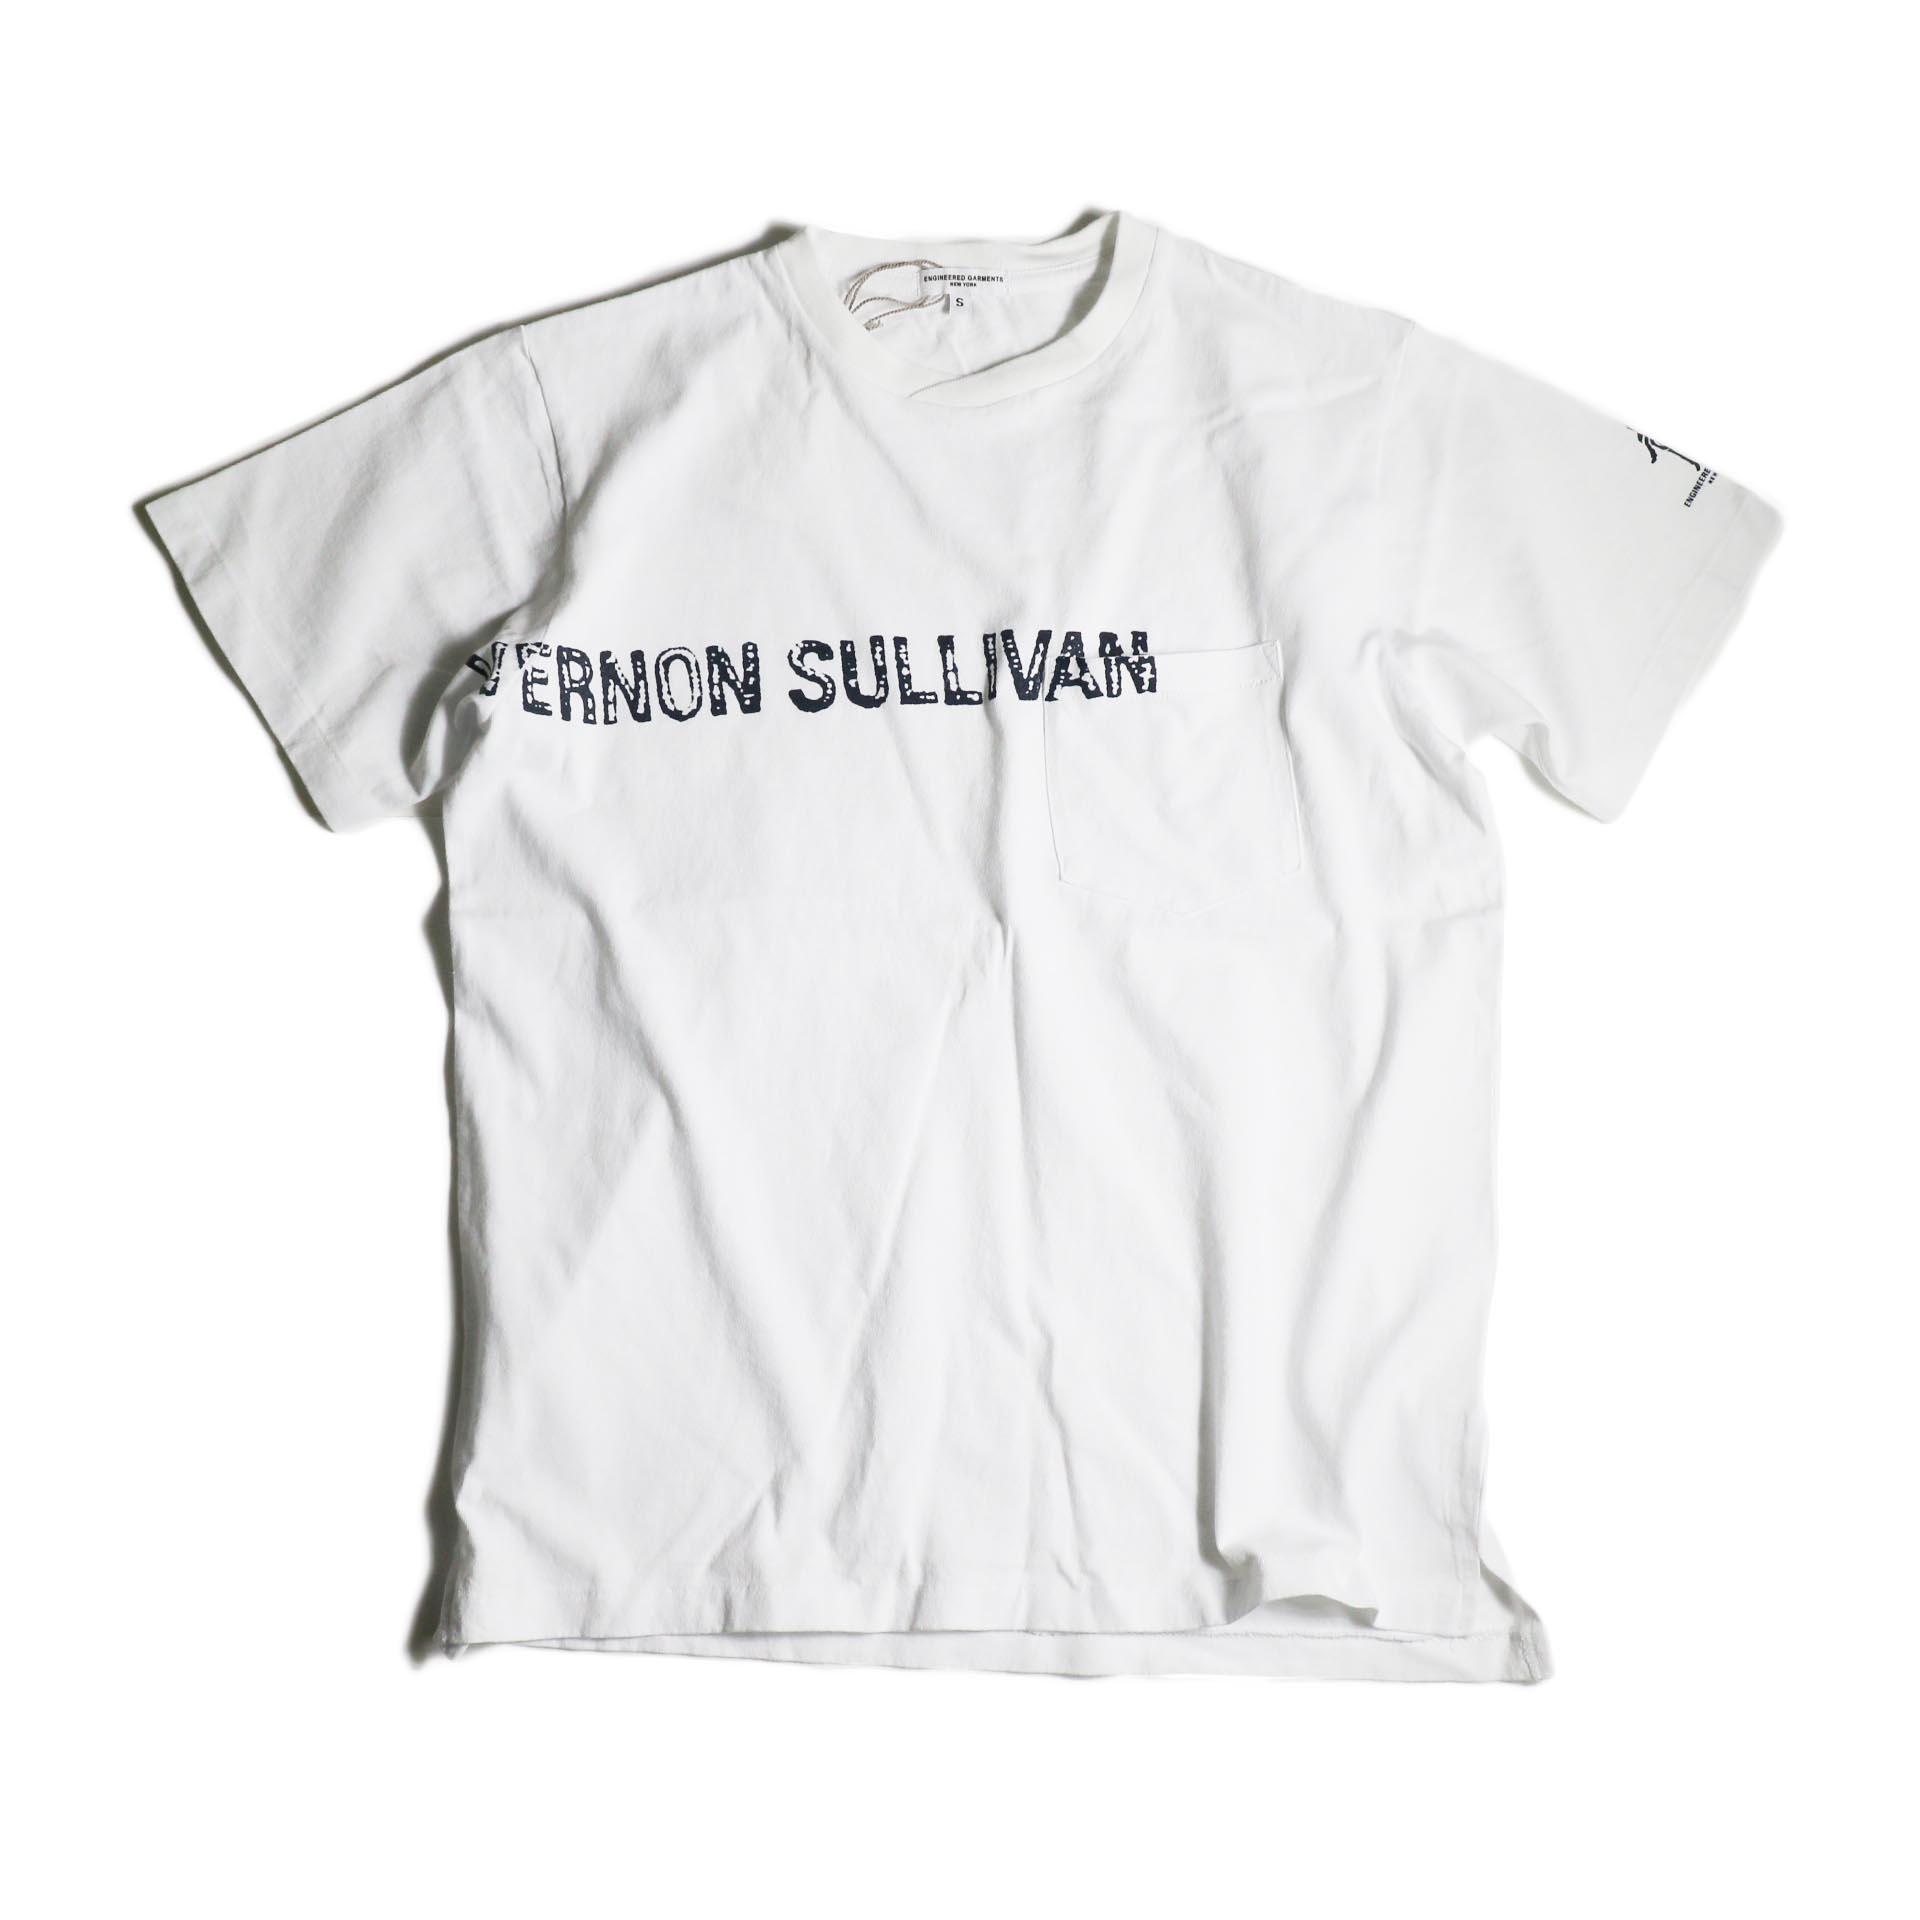 Engineered Garments / Printed Cross Crew Neck T-shirt -Vernon (White)